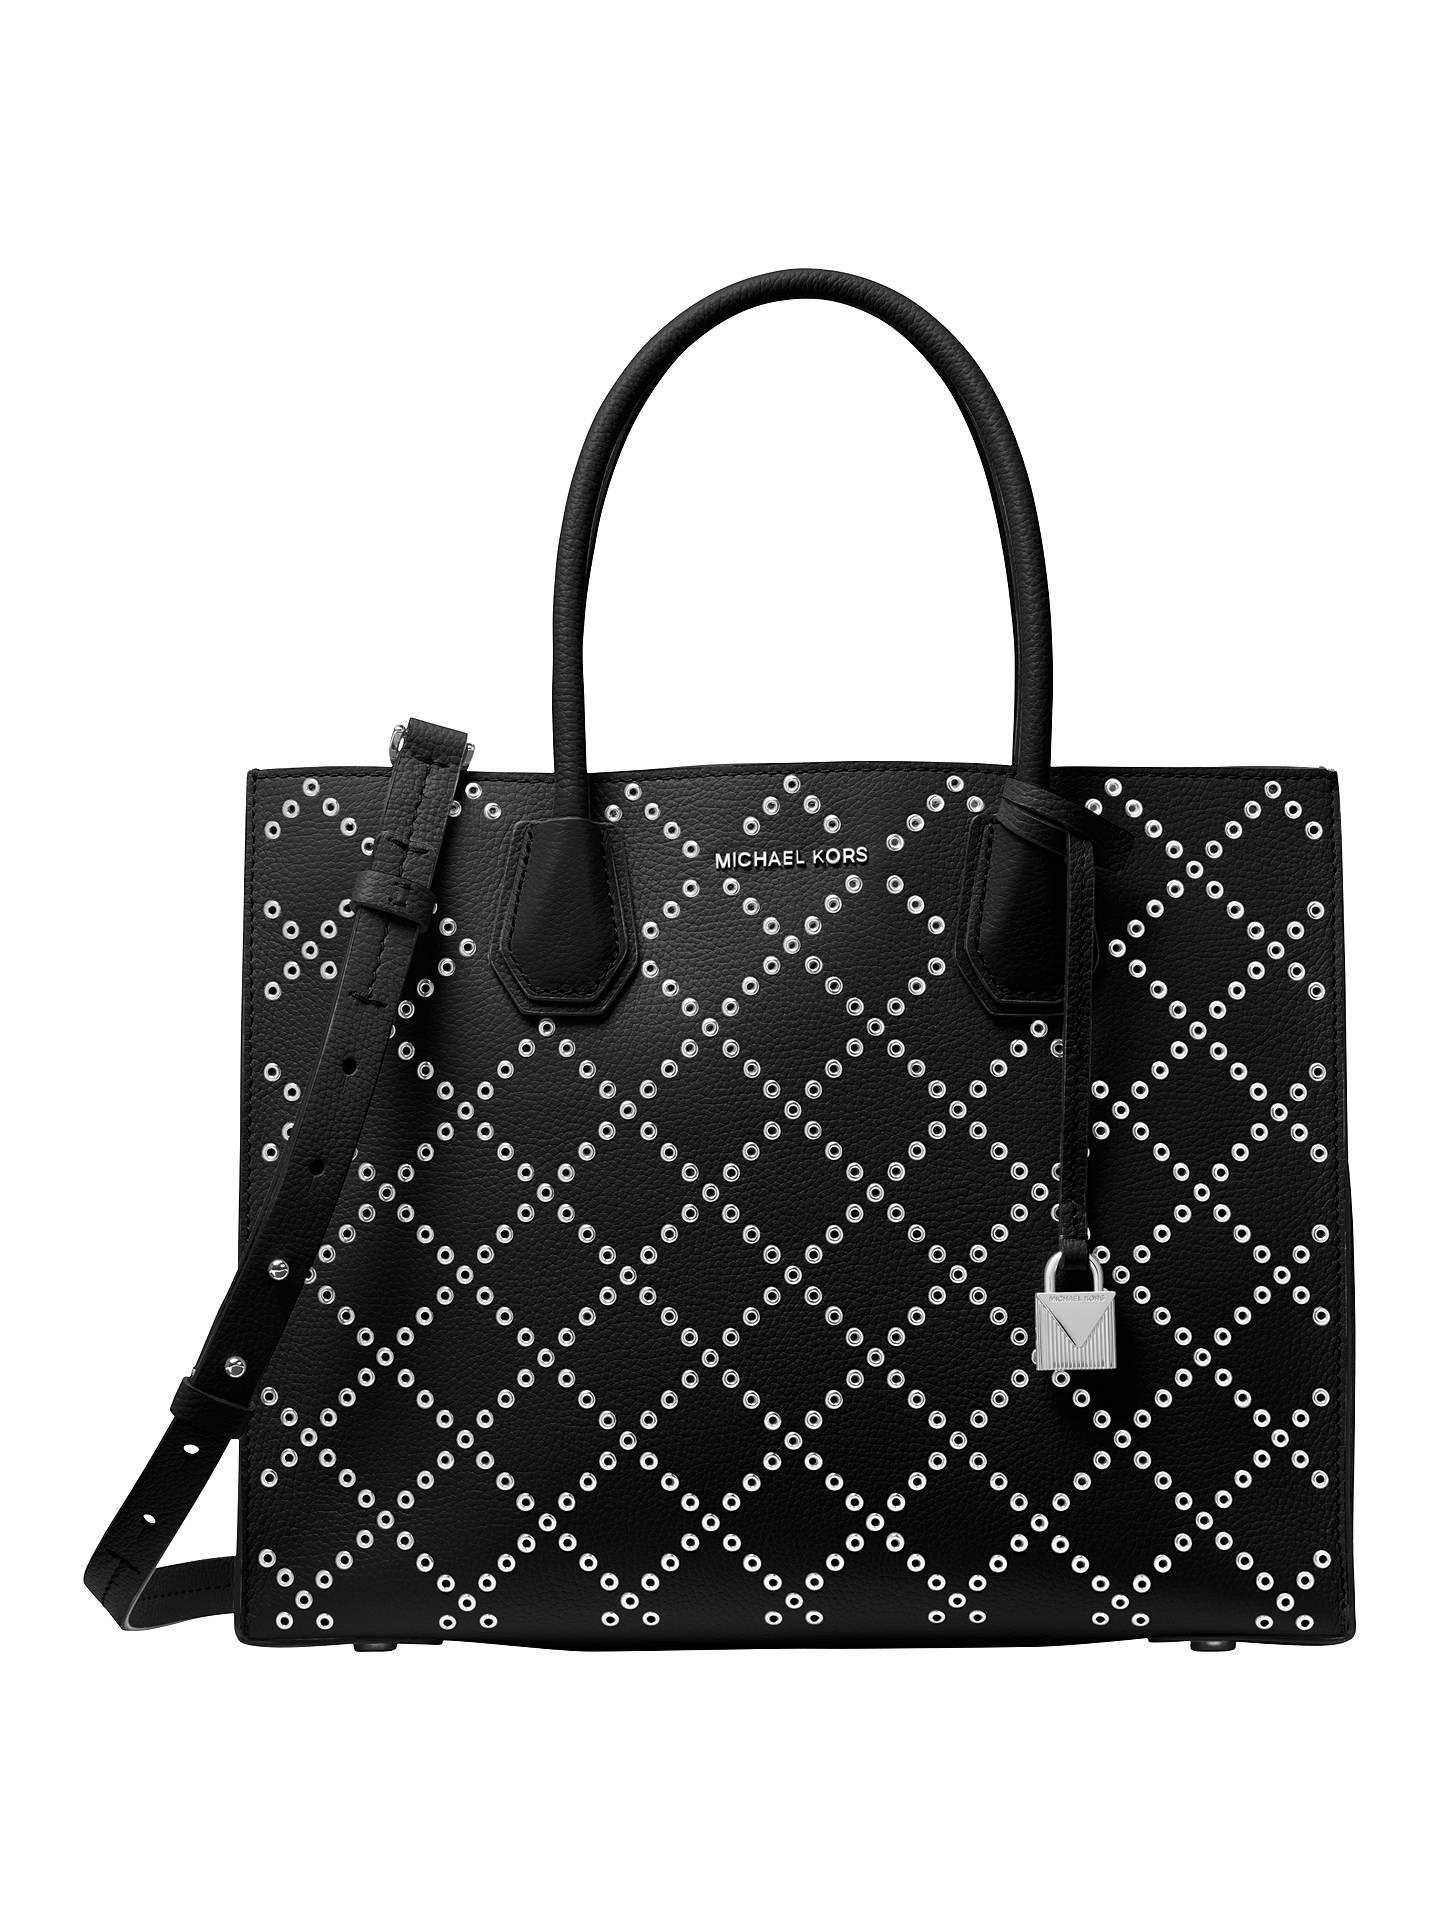 58e39093b48426 Buy MICHAEL Michael Kors Mercer Stud Large Leather Tote Bag, Black/Silver  Online at ...